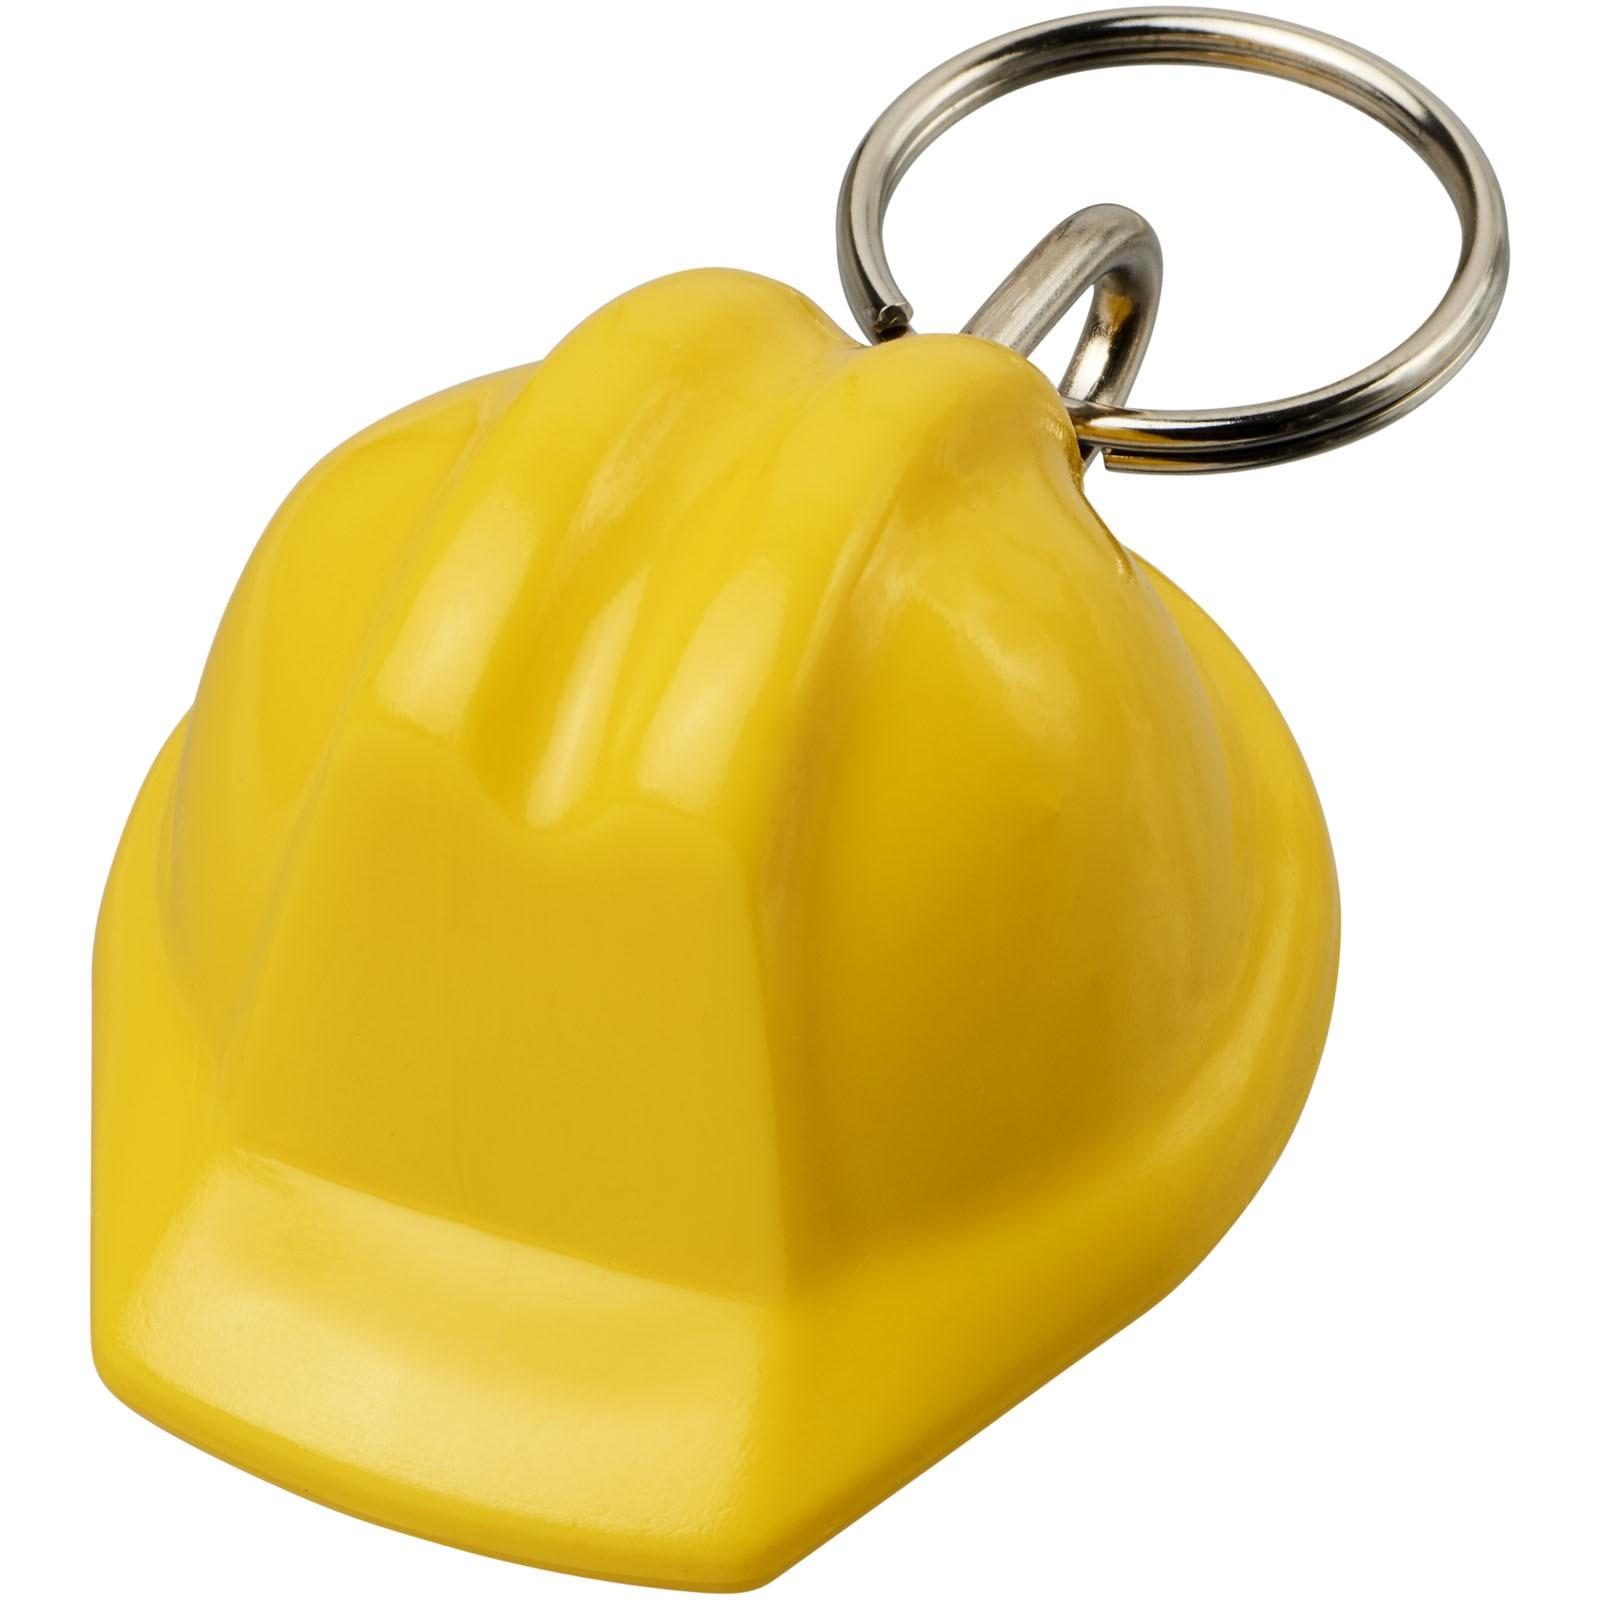 Kolt hard-hat-shaped keychain - Yellow